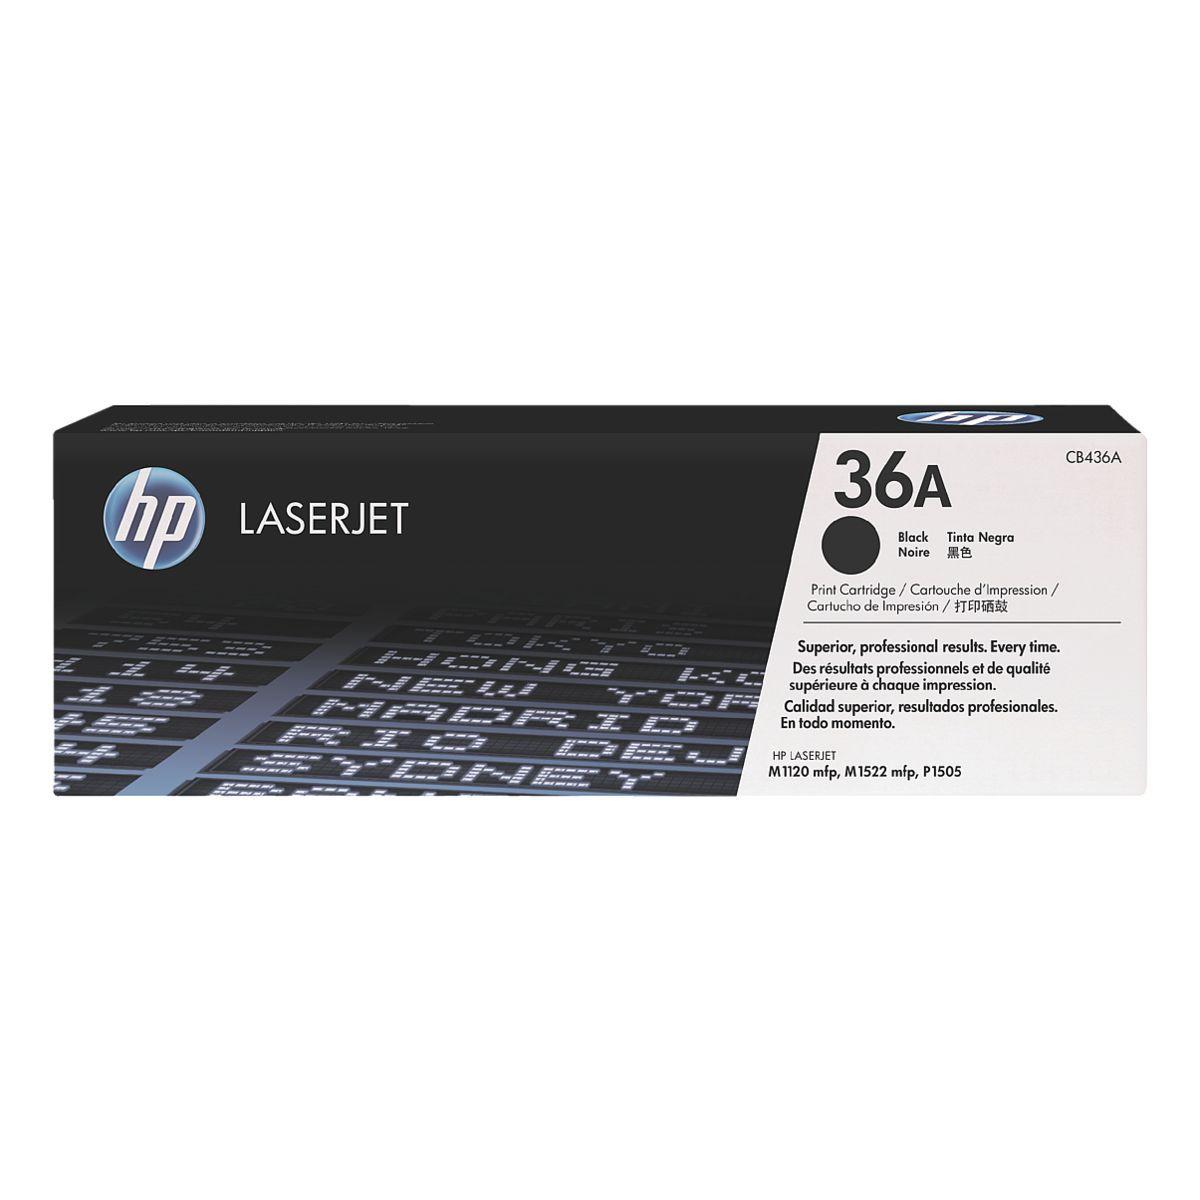 HP 36A LaserJet schwarz (CB436A)